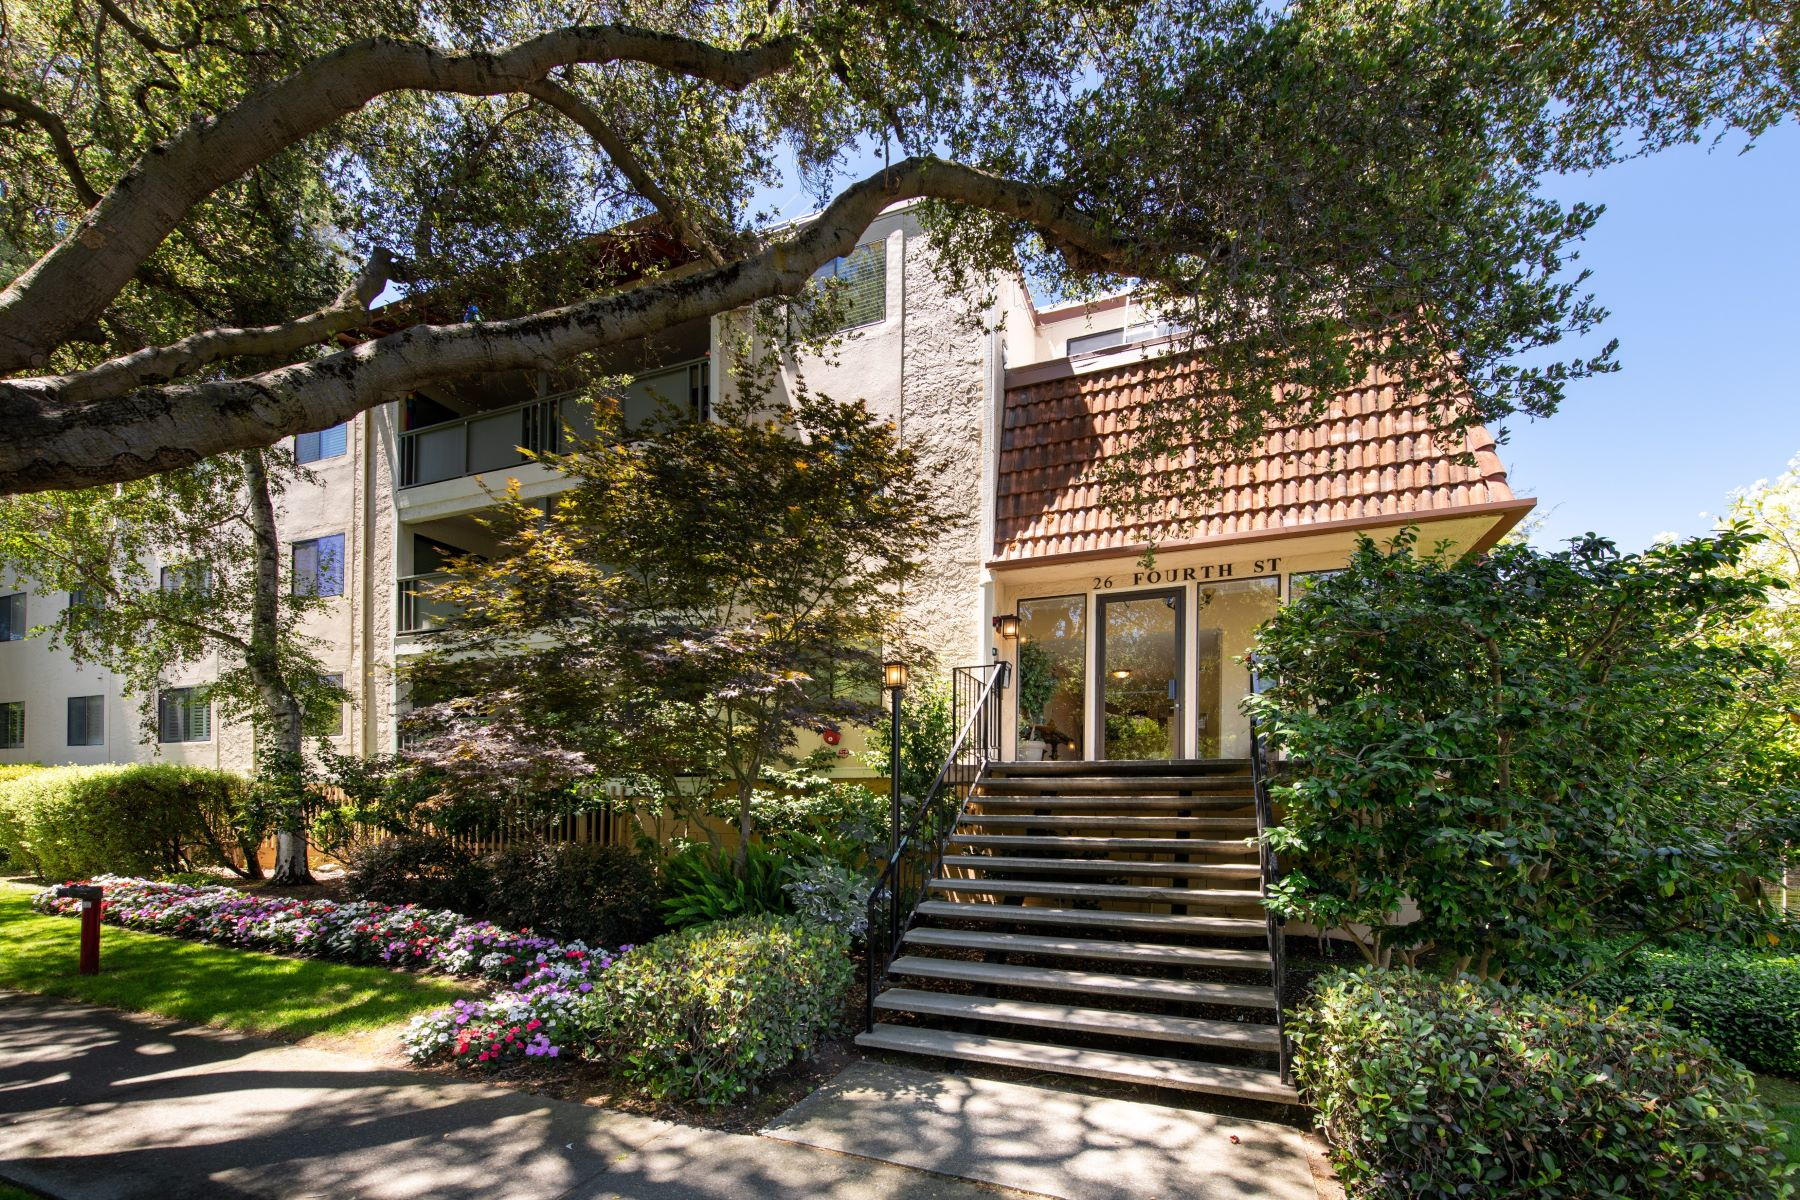 Condominiums for Sale at 26 4th Street #1 Los Altos, California 94022 United States